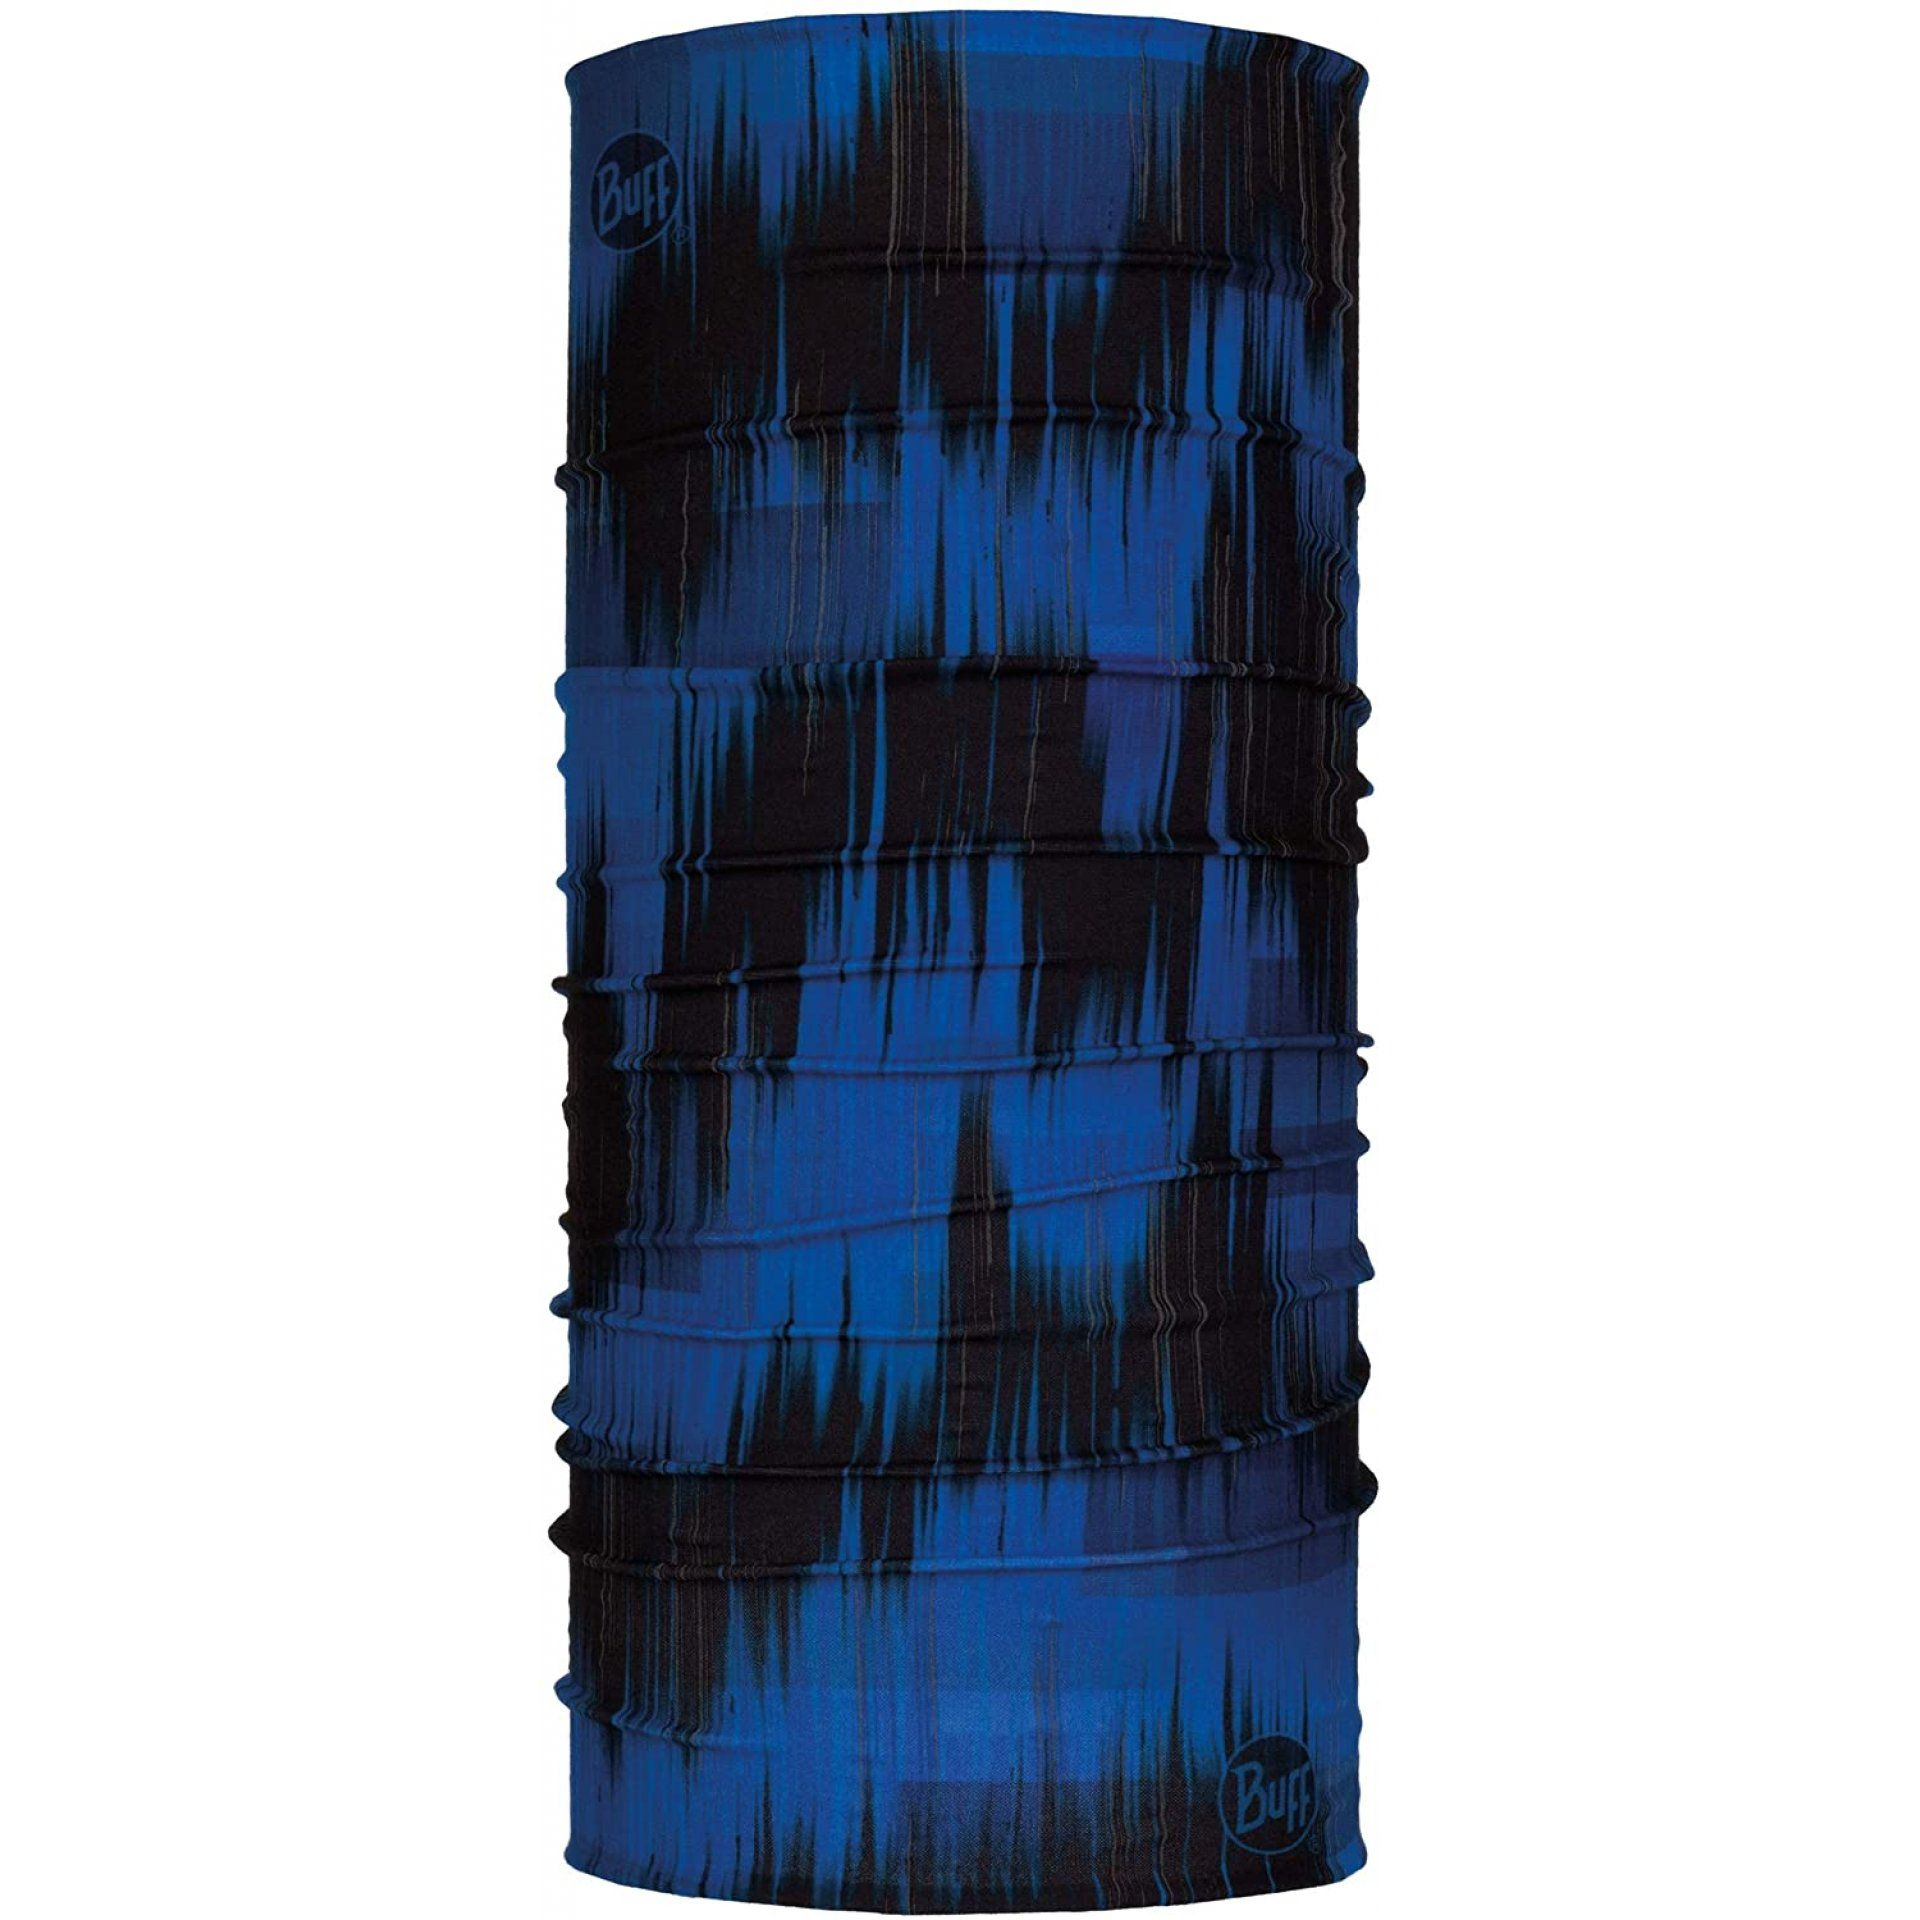 BUFF REFLECTIVE US R-PULSE CAPE BLUE